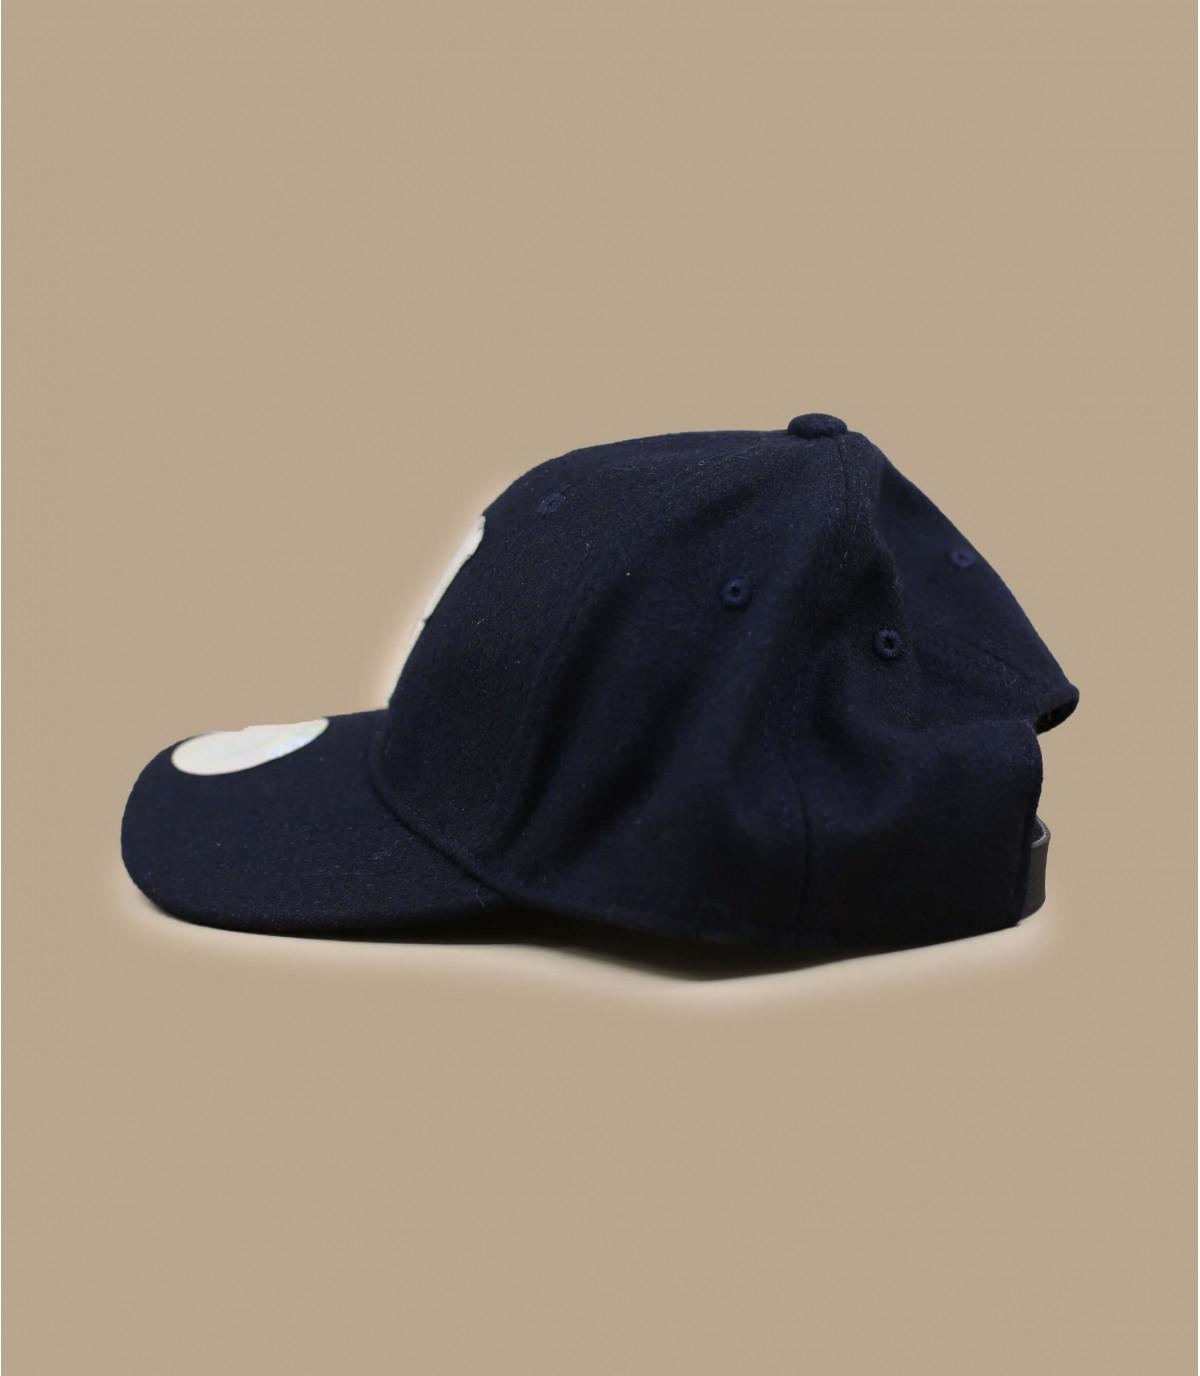 Cappellino trucker blu marine